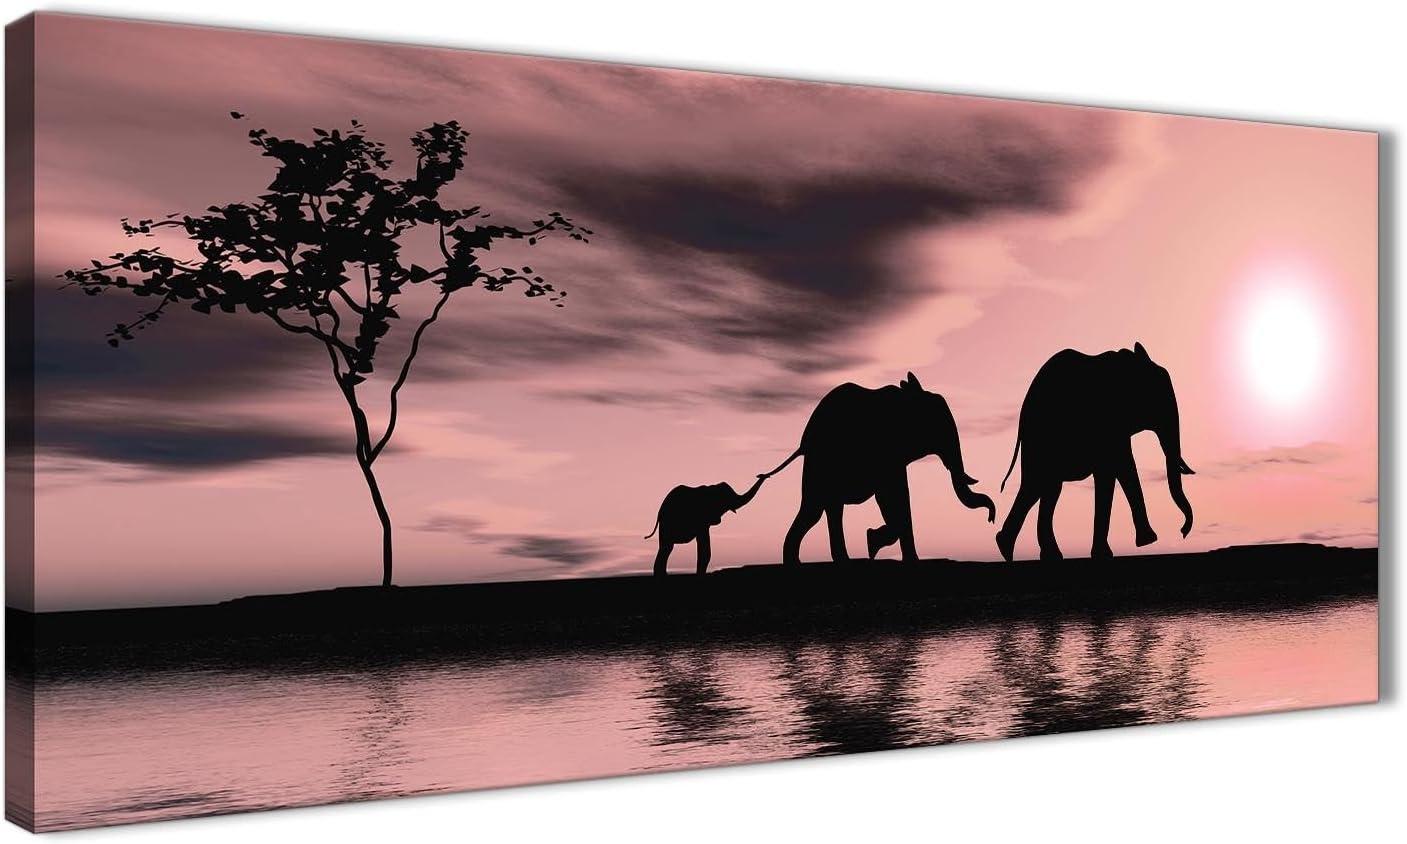 color rosa Wallfillers Lienzo decorativo para pared 1361 dise/ño de elefantes africanos 120 cm de ancho